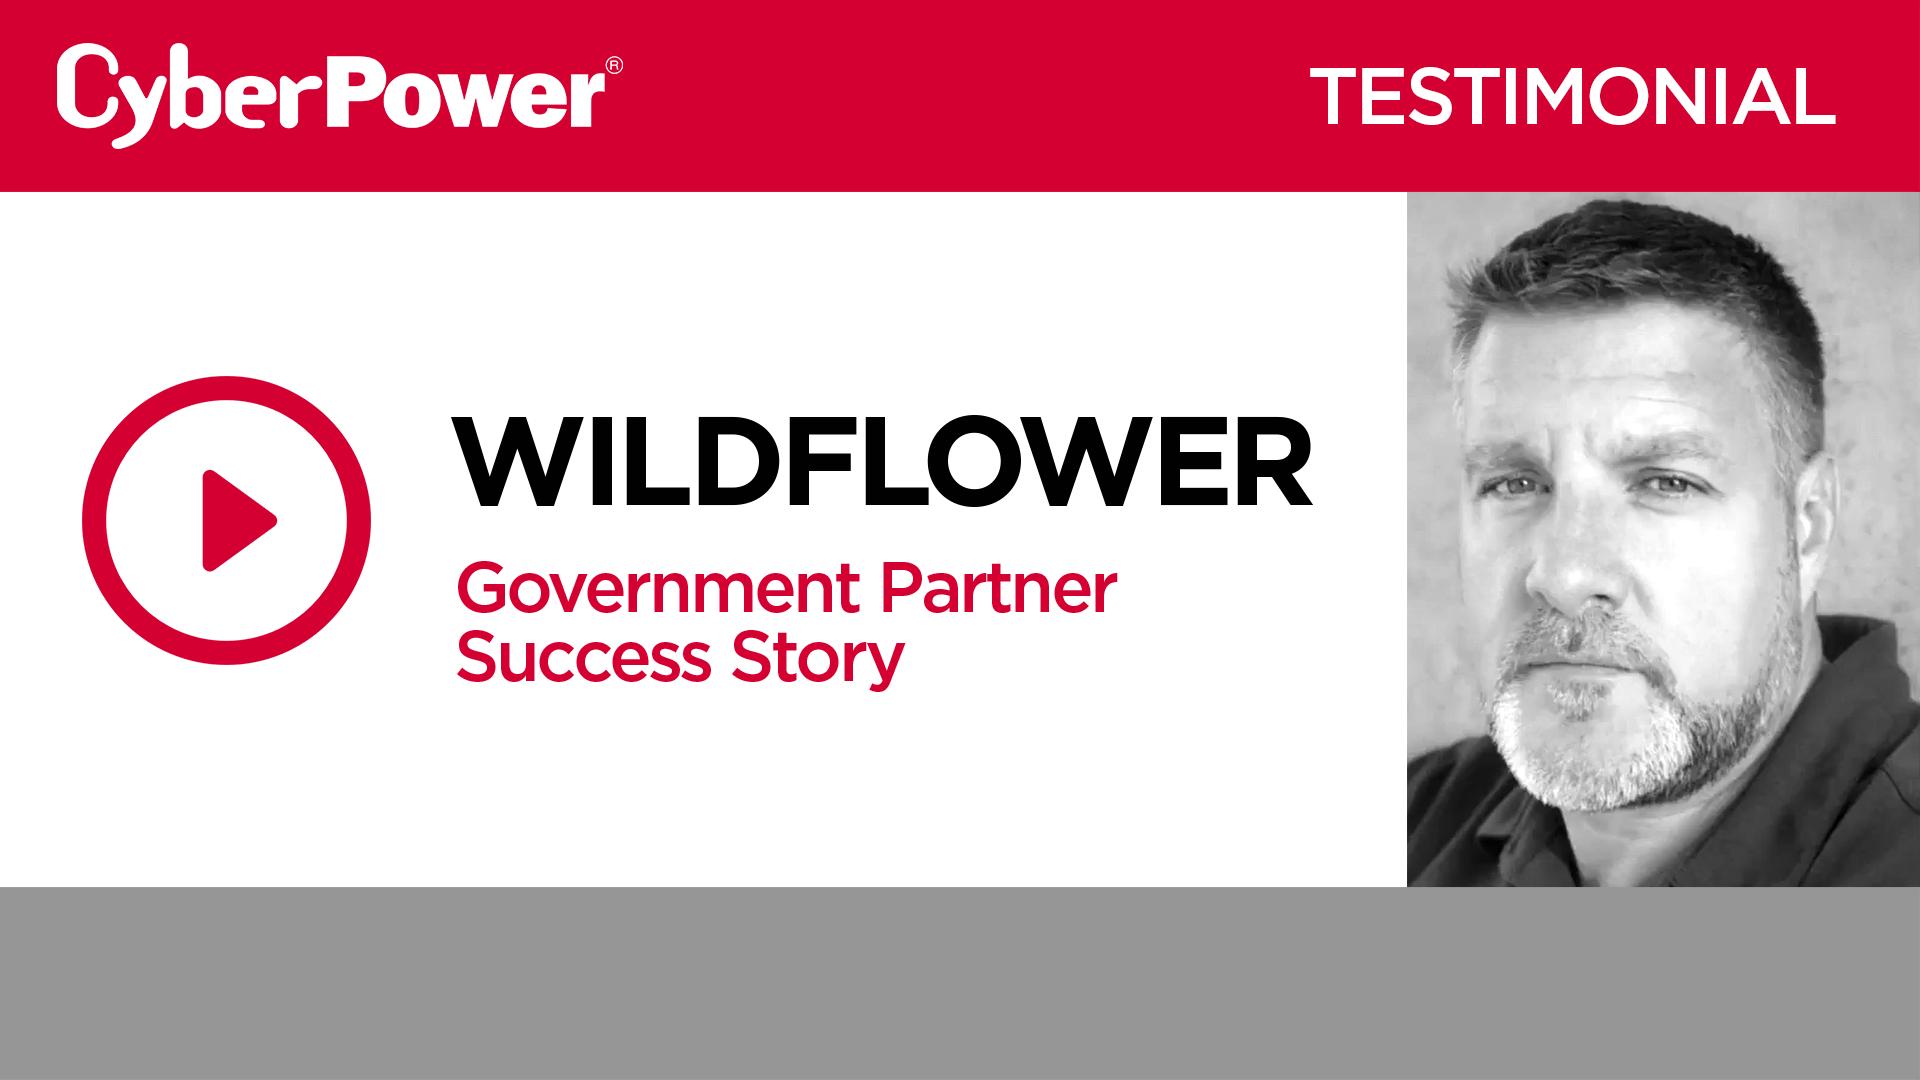 Wildflower Government Testimonial